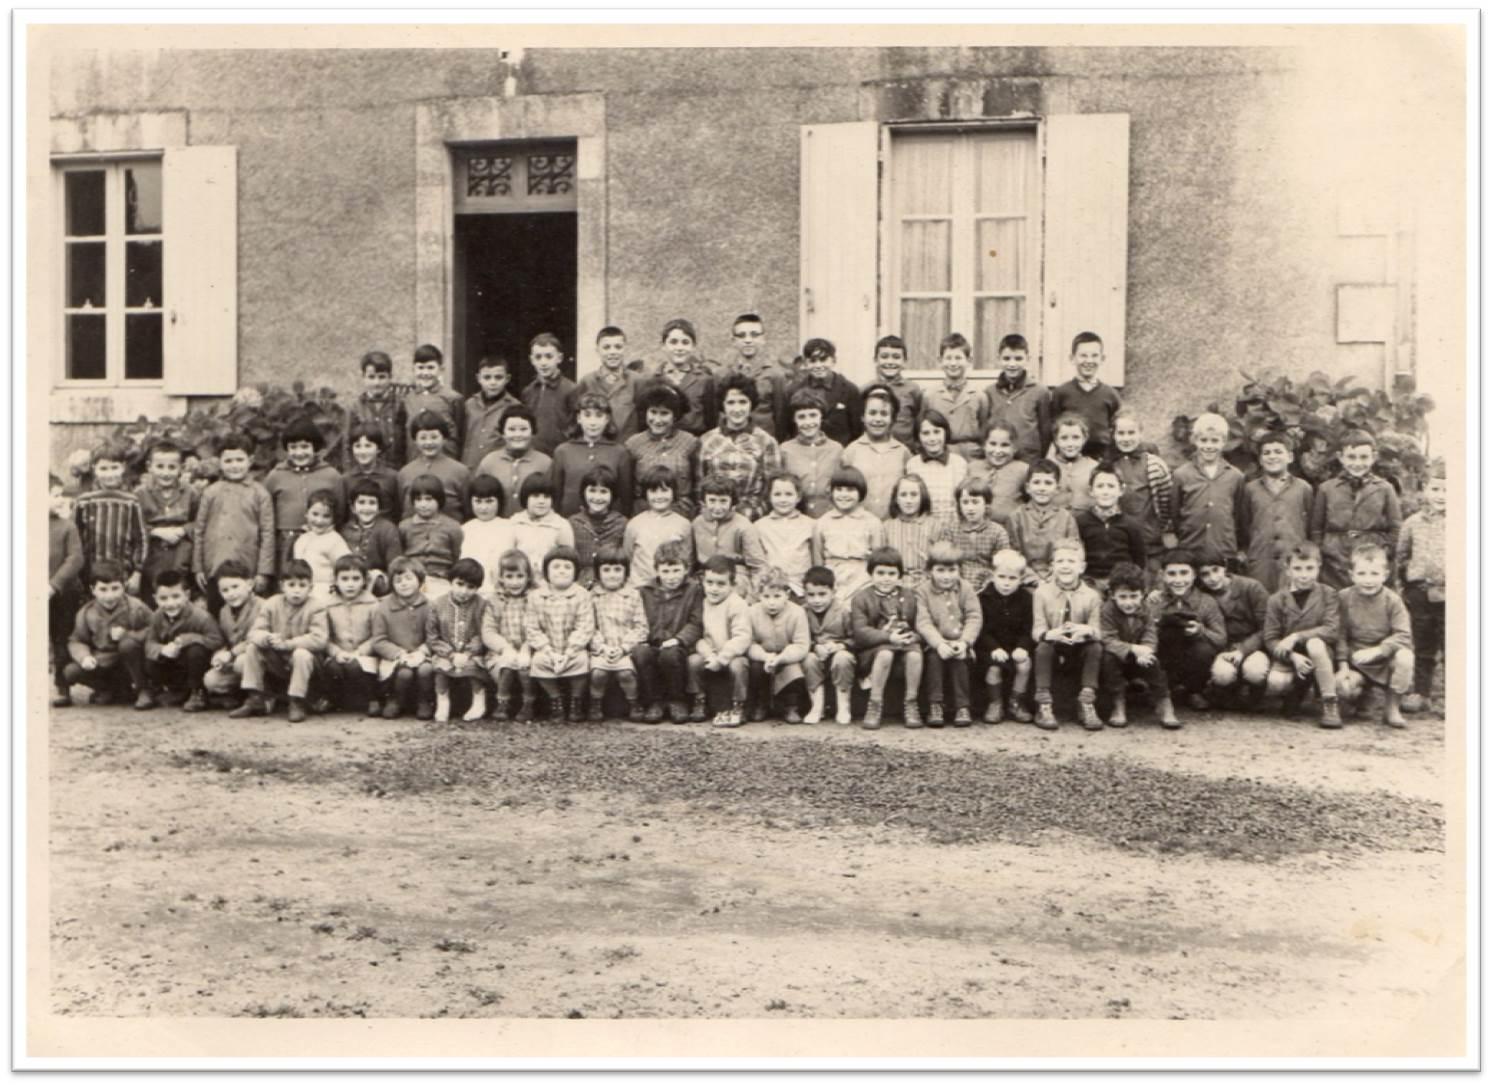 Ecole de La Couarde v 1960.jpg